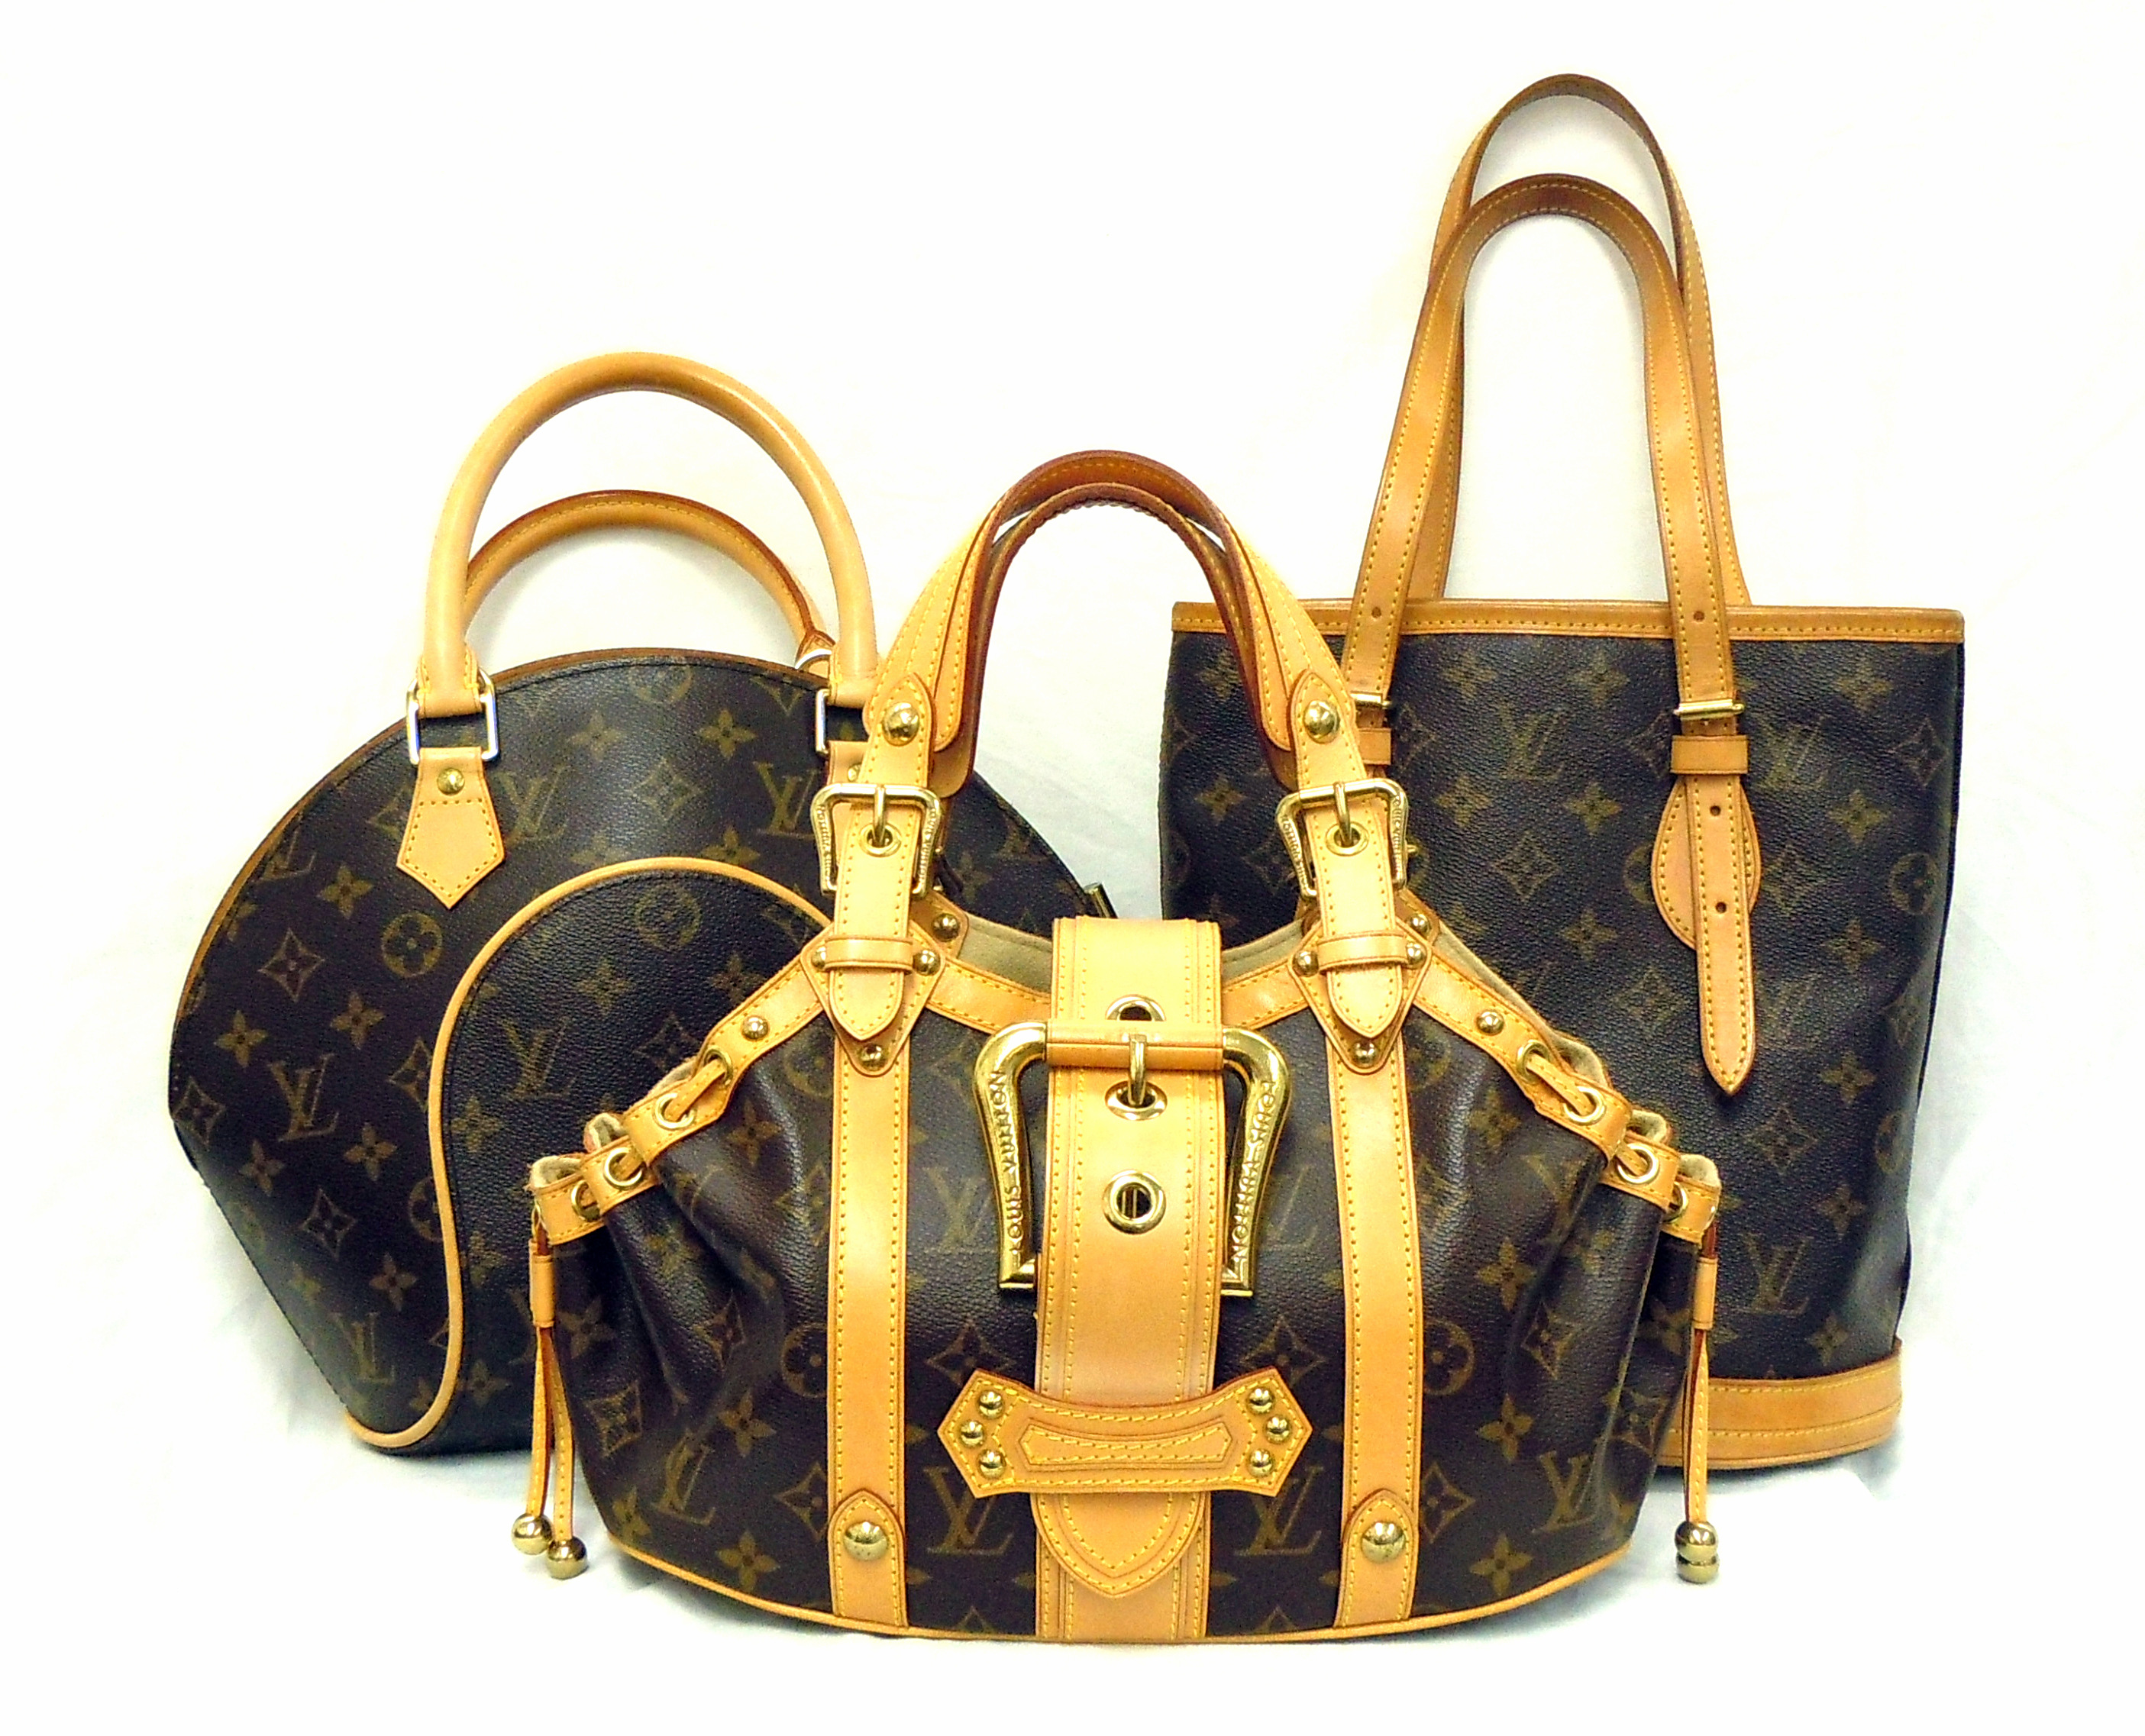 Louis Vuitton- Classic Monogram Bags